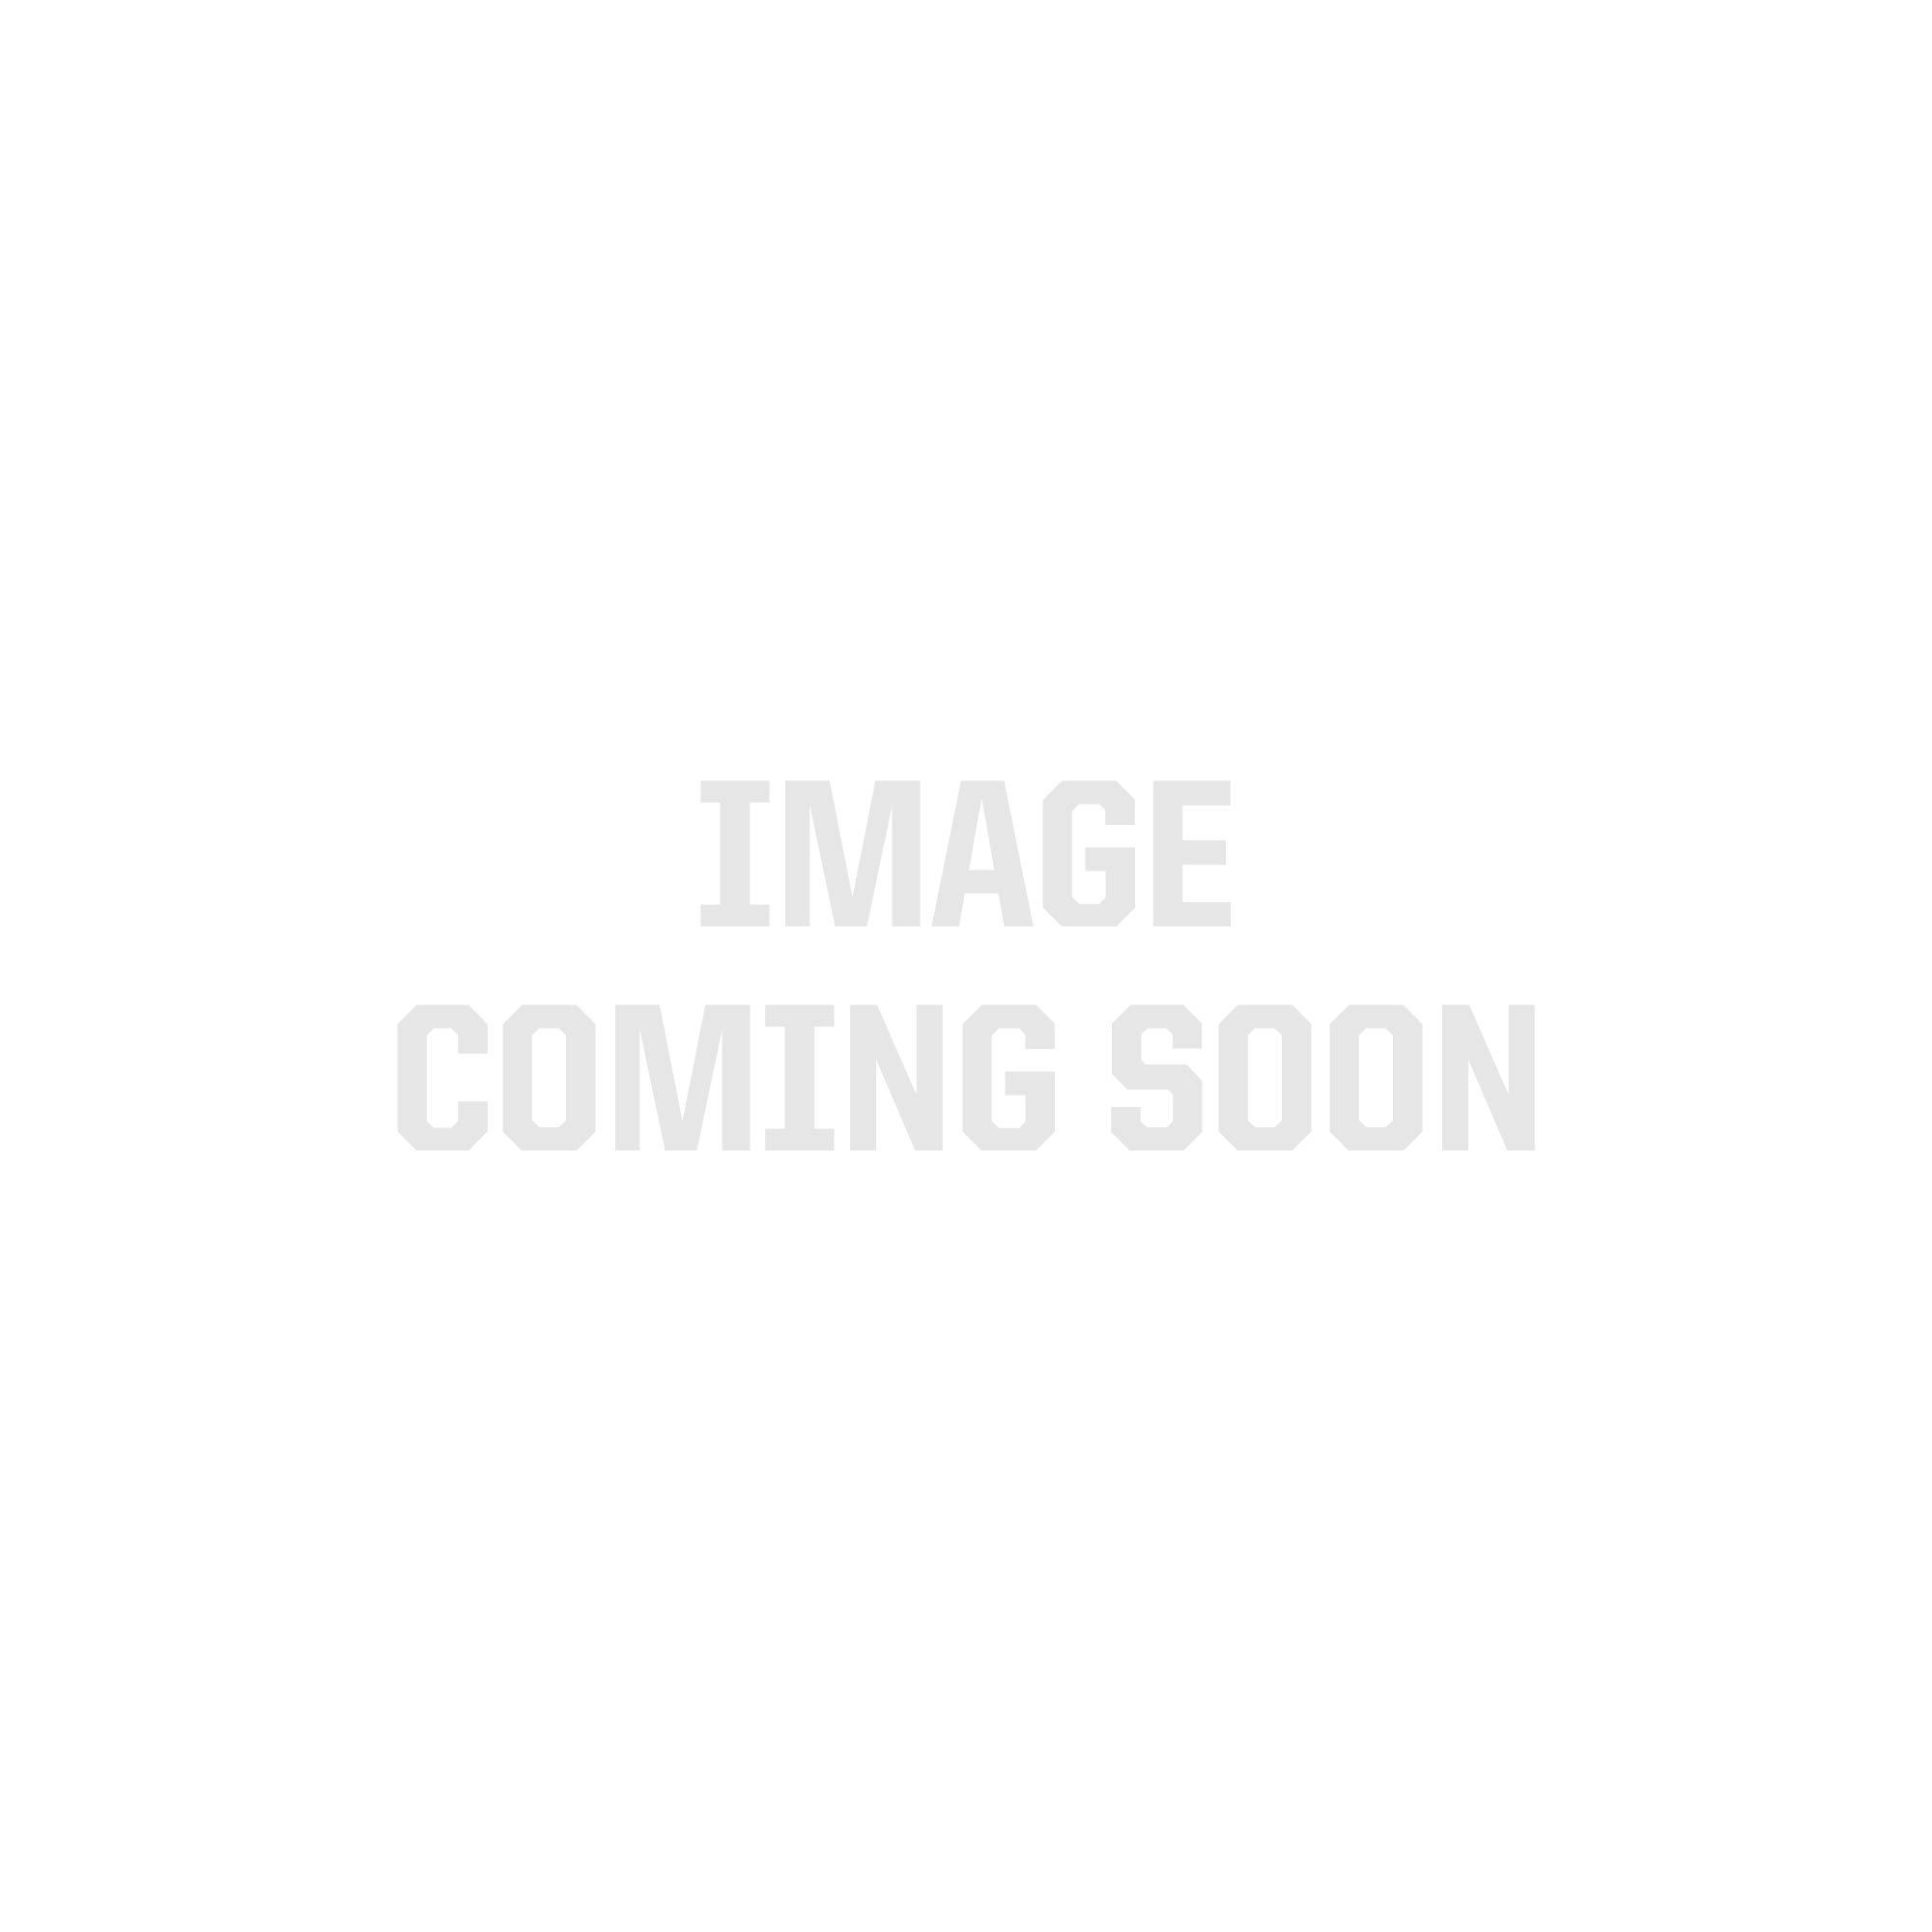 Amelia Crew Tri-Blend Short Sleeve Tee